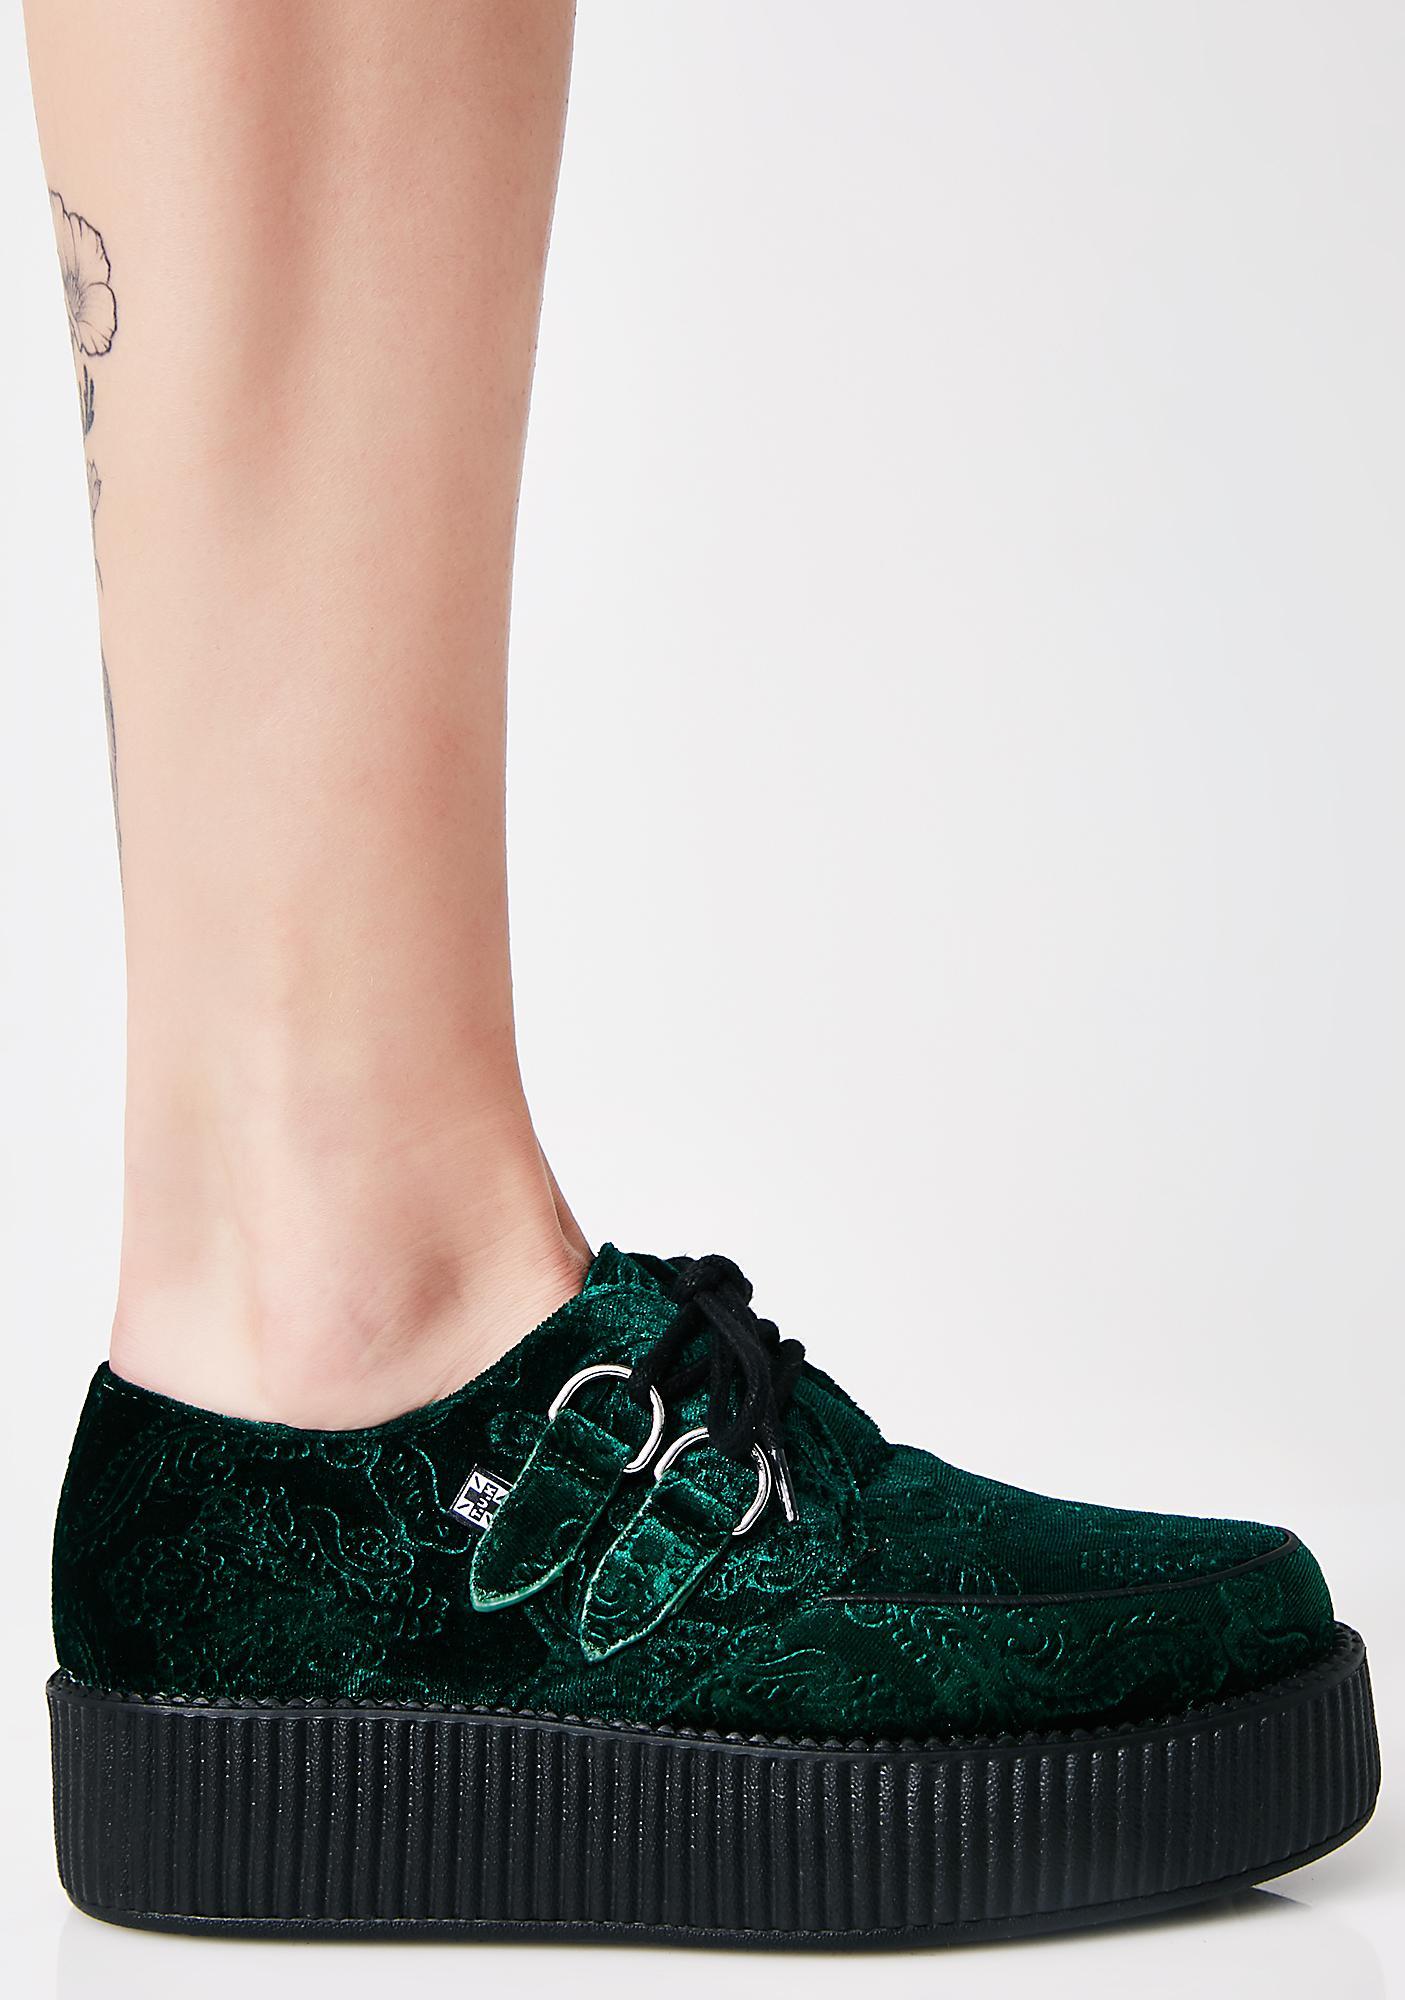 T.U.K. Emerald Embossed Velvet Mondo Viva Creepers